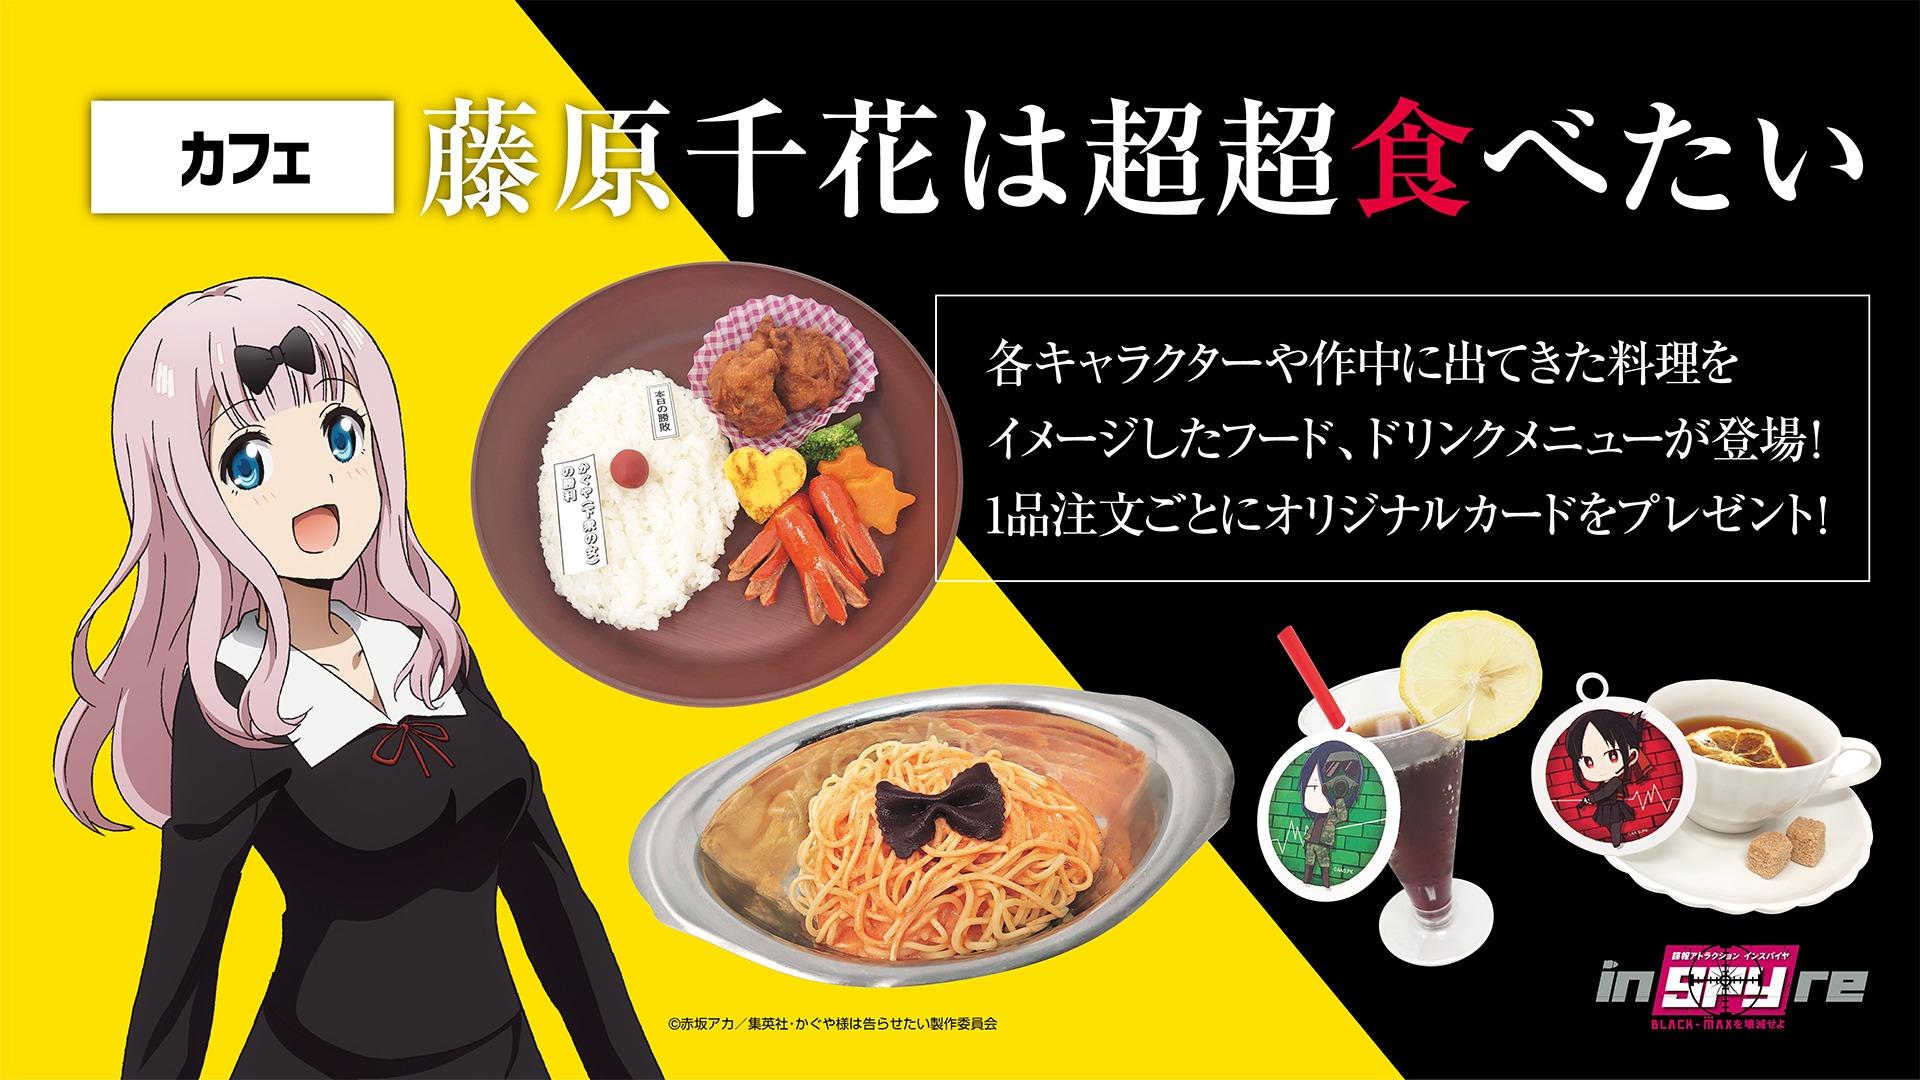 (C)赤坂アカ/集英社・かぐや様は告らせたい製作委員会